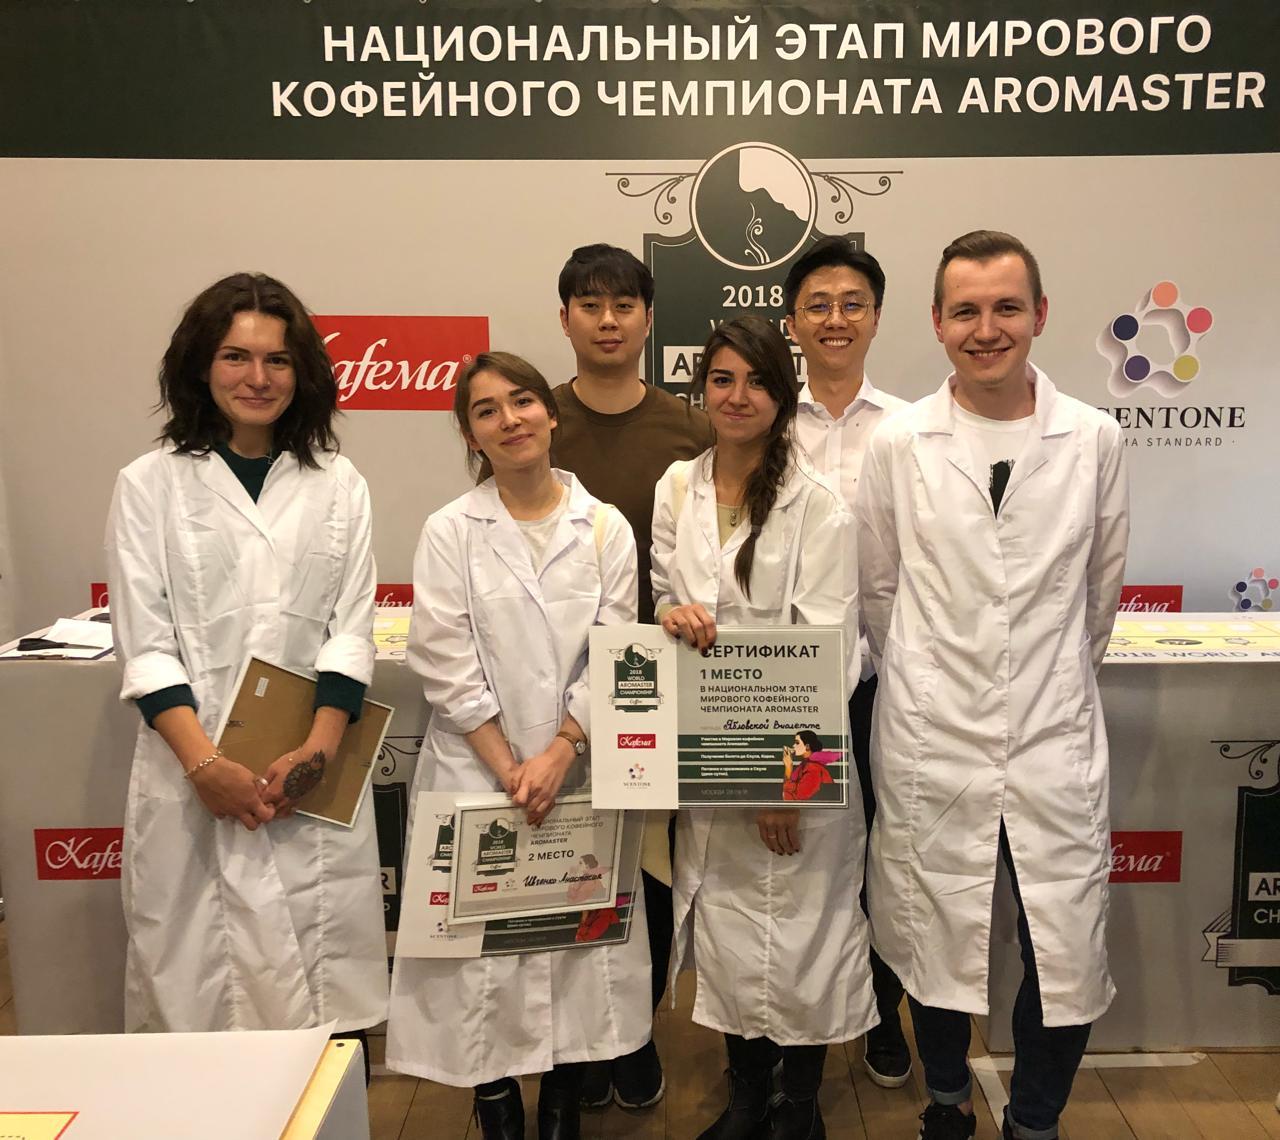 Победители национального этап WORLD AROMASTER CHAMPIONSHIP of Coffee